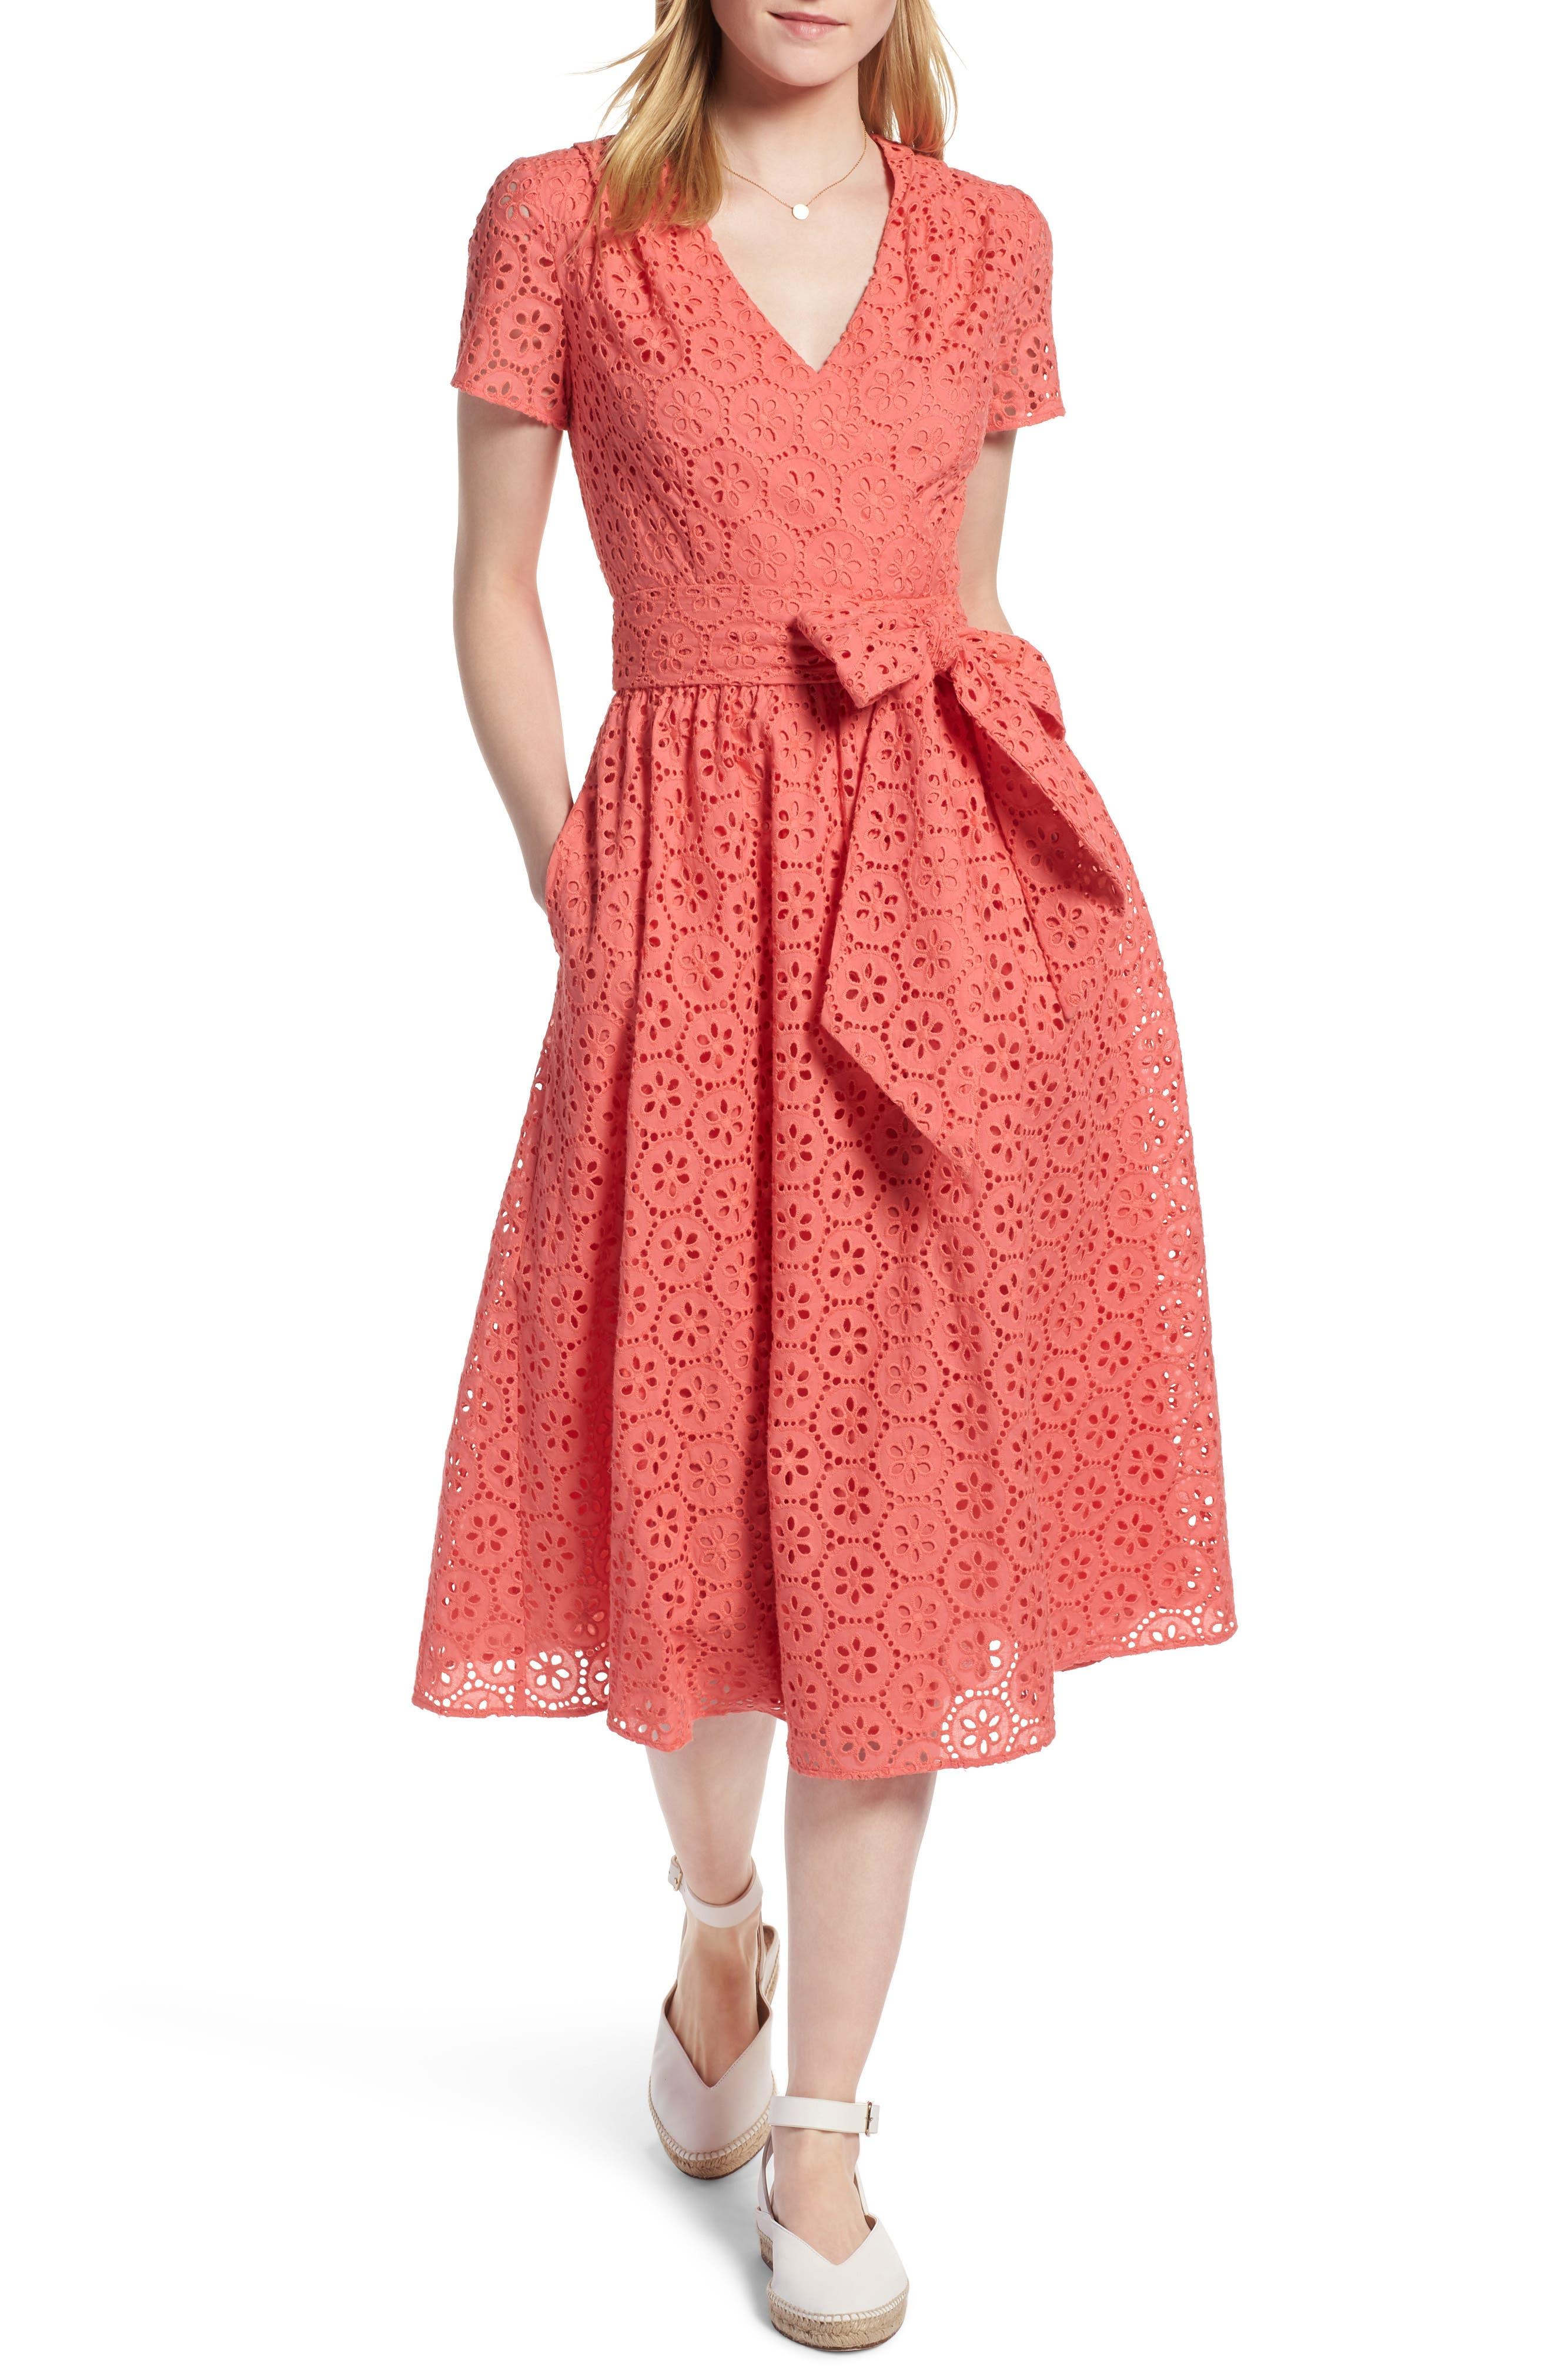 1901 Cotton Eyelet Short Sleeve Dress (Regular & Petite)